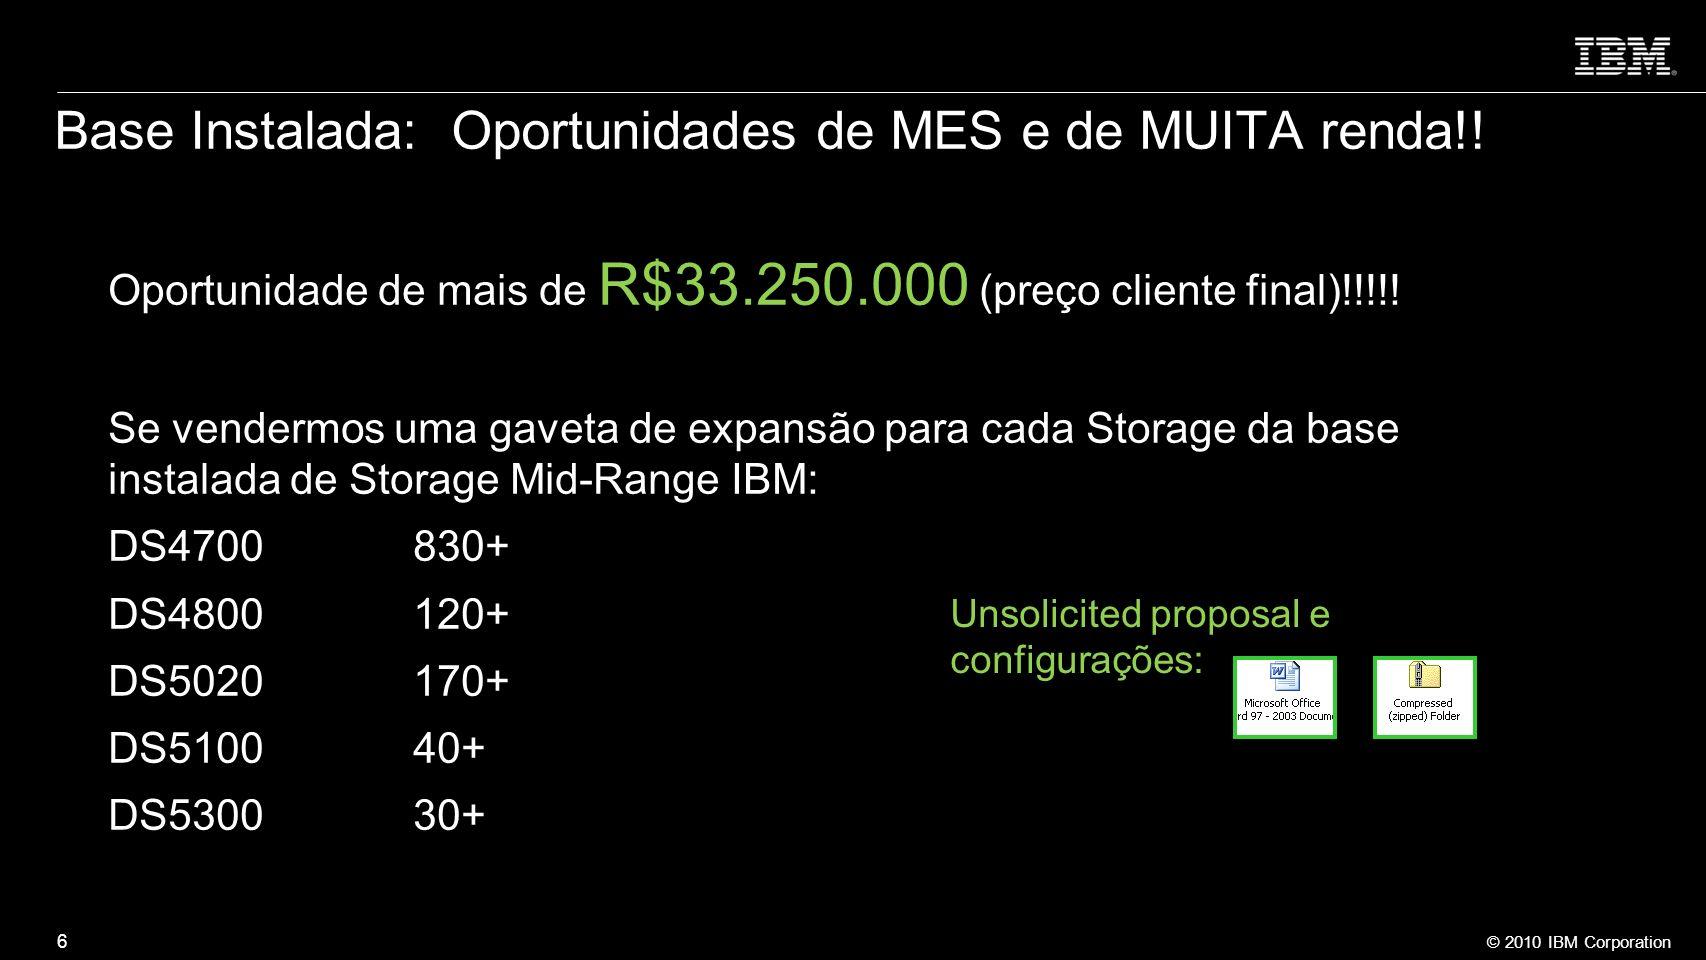 Base Instalada: Oportunidades de MES e de MUITA renda!!